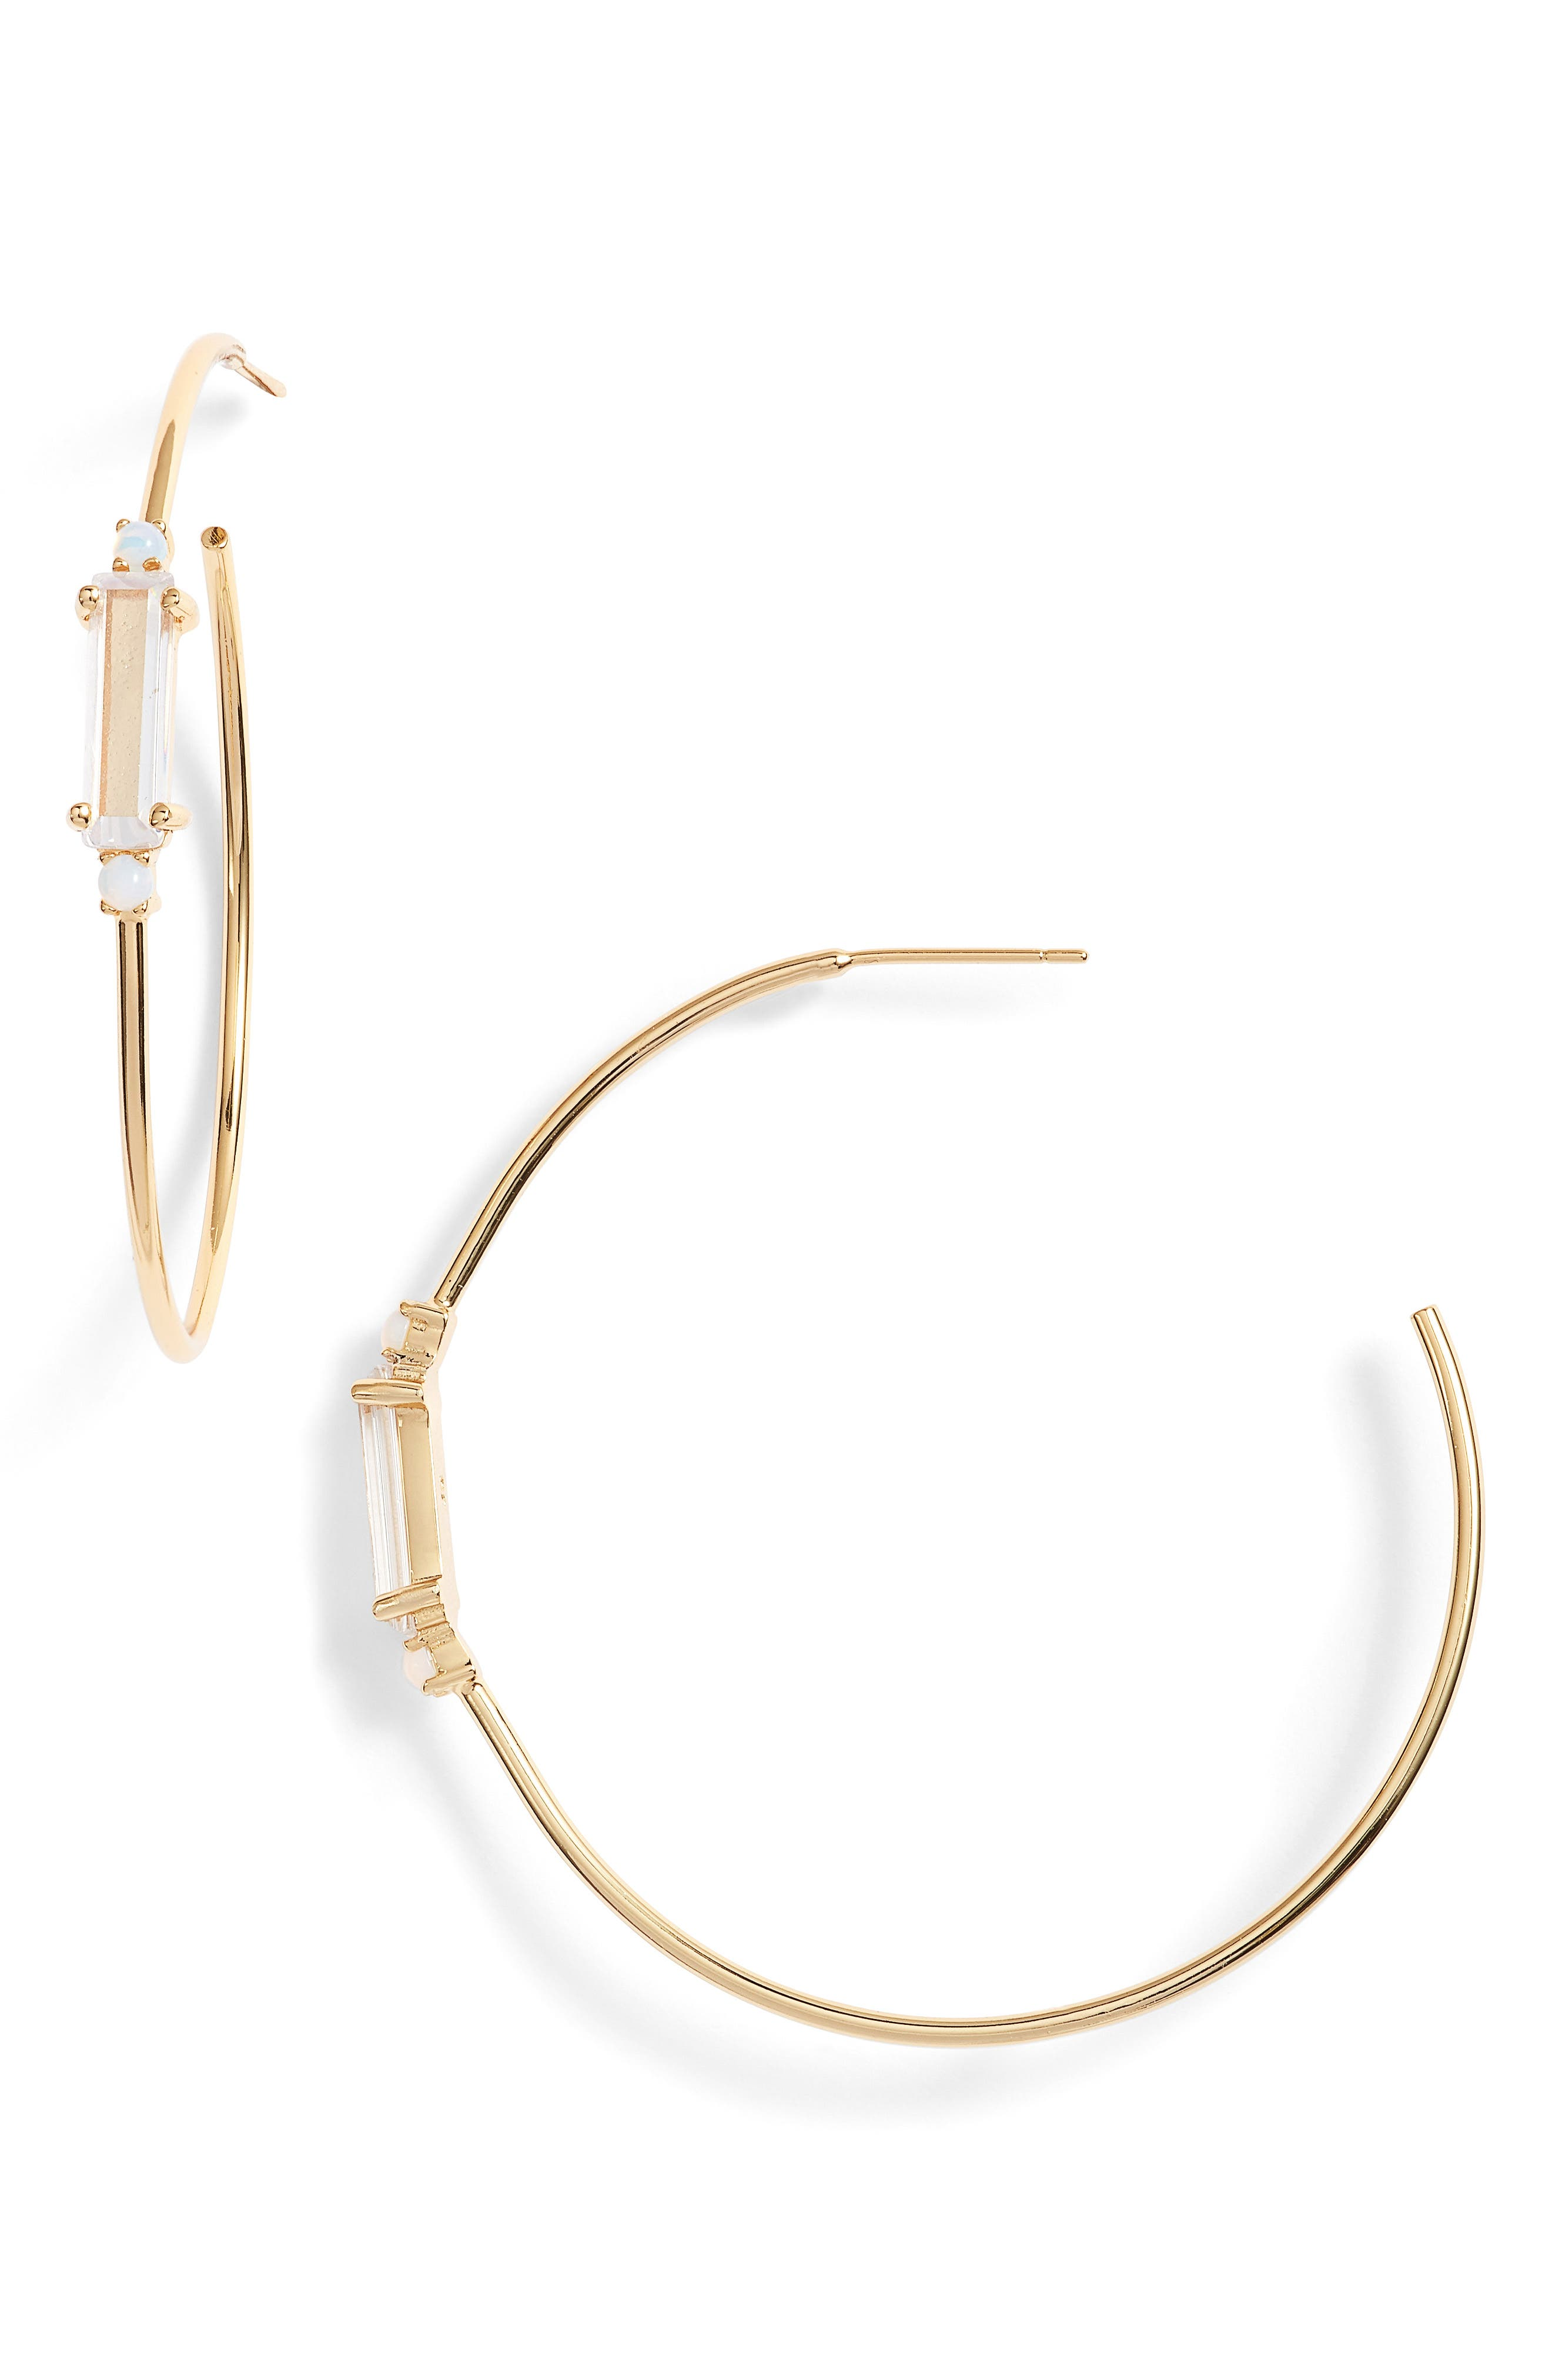 Leilani Cubic Zirconia Hoop Earrings,                             Main thumbnail 1, color,                             710